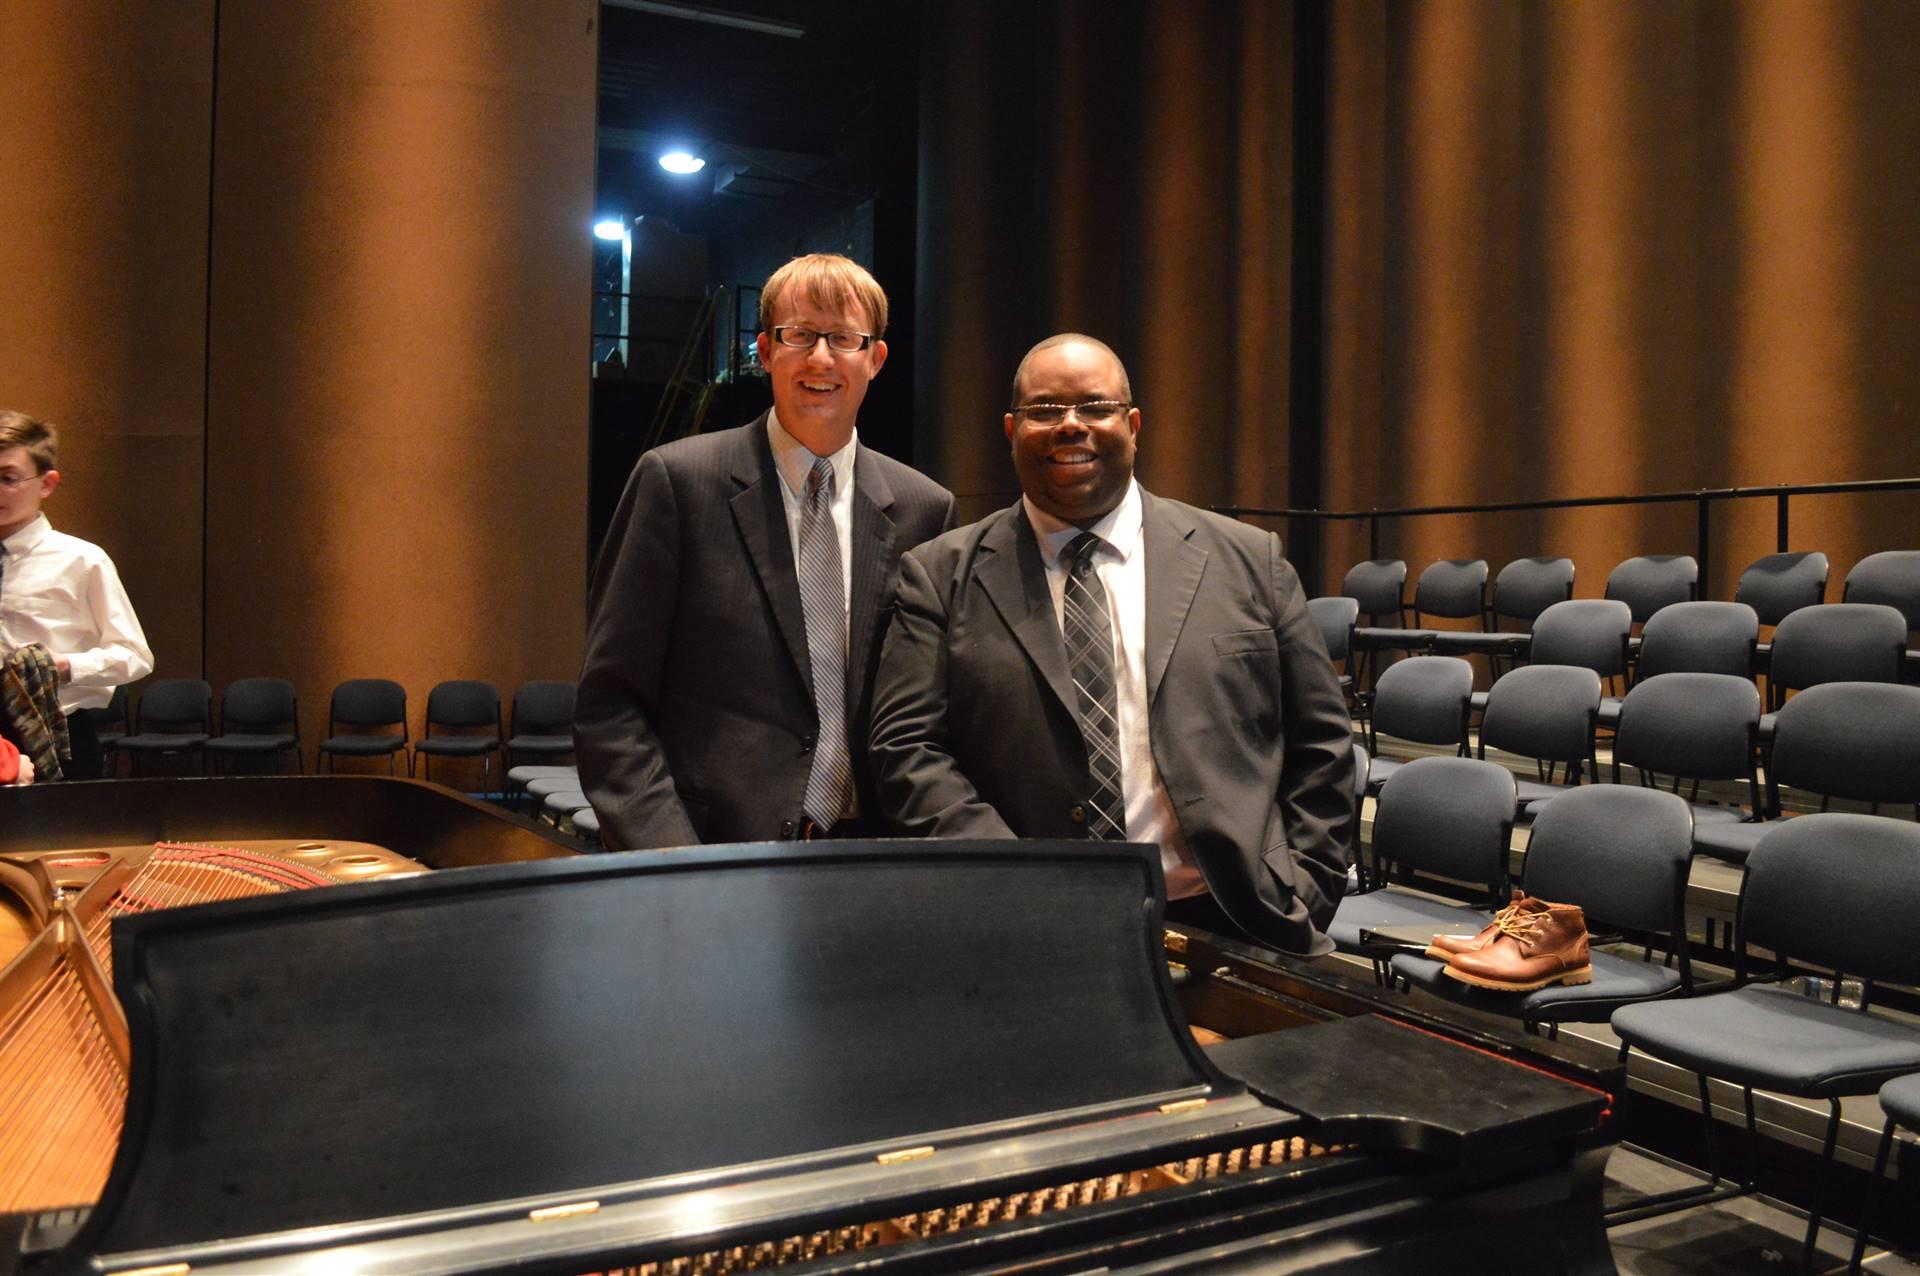 Guest Conductors, Dr. Brian Silvey (band) and Dr. Roosevelt Escalante (choir)